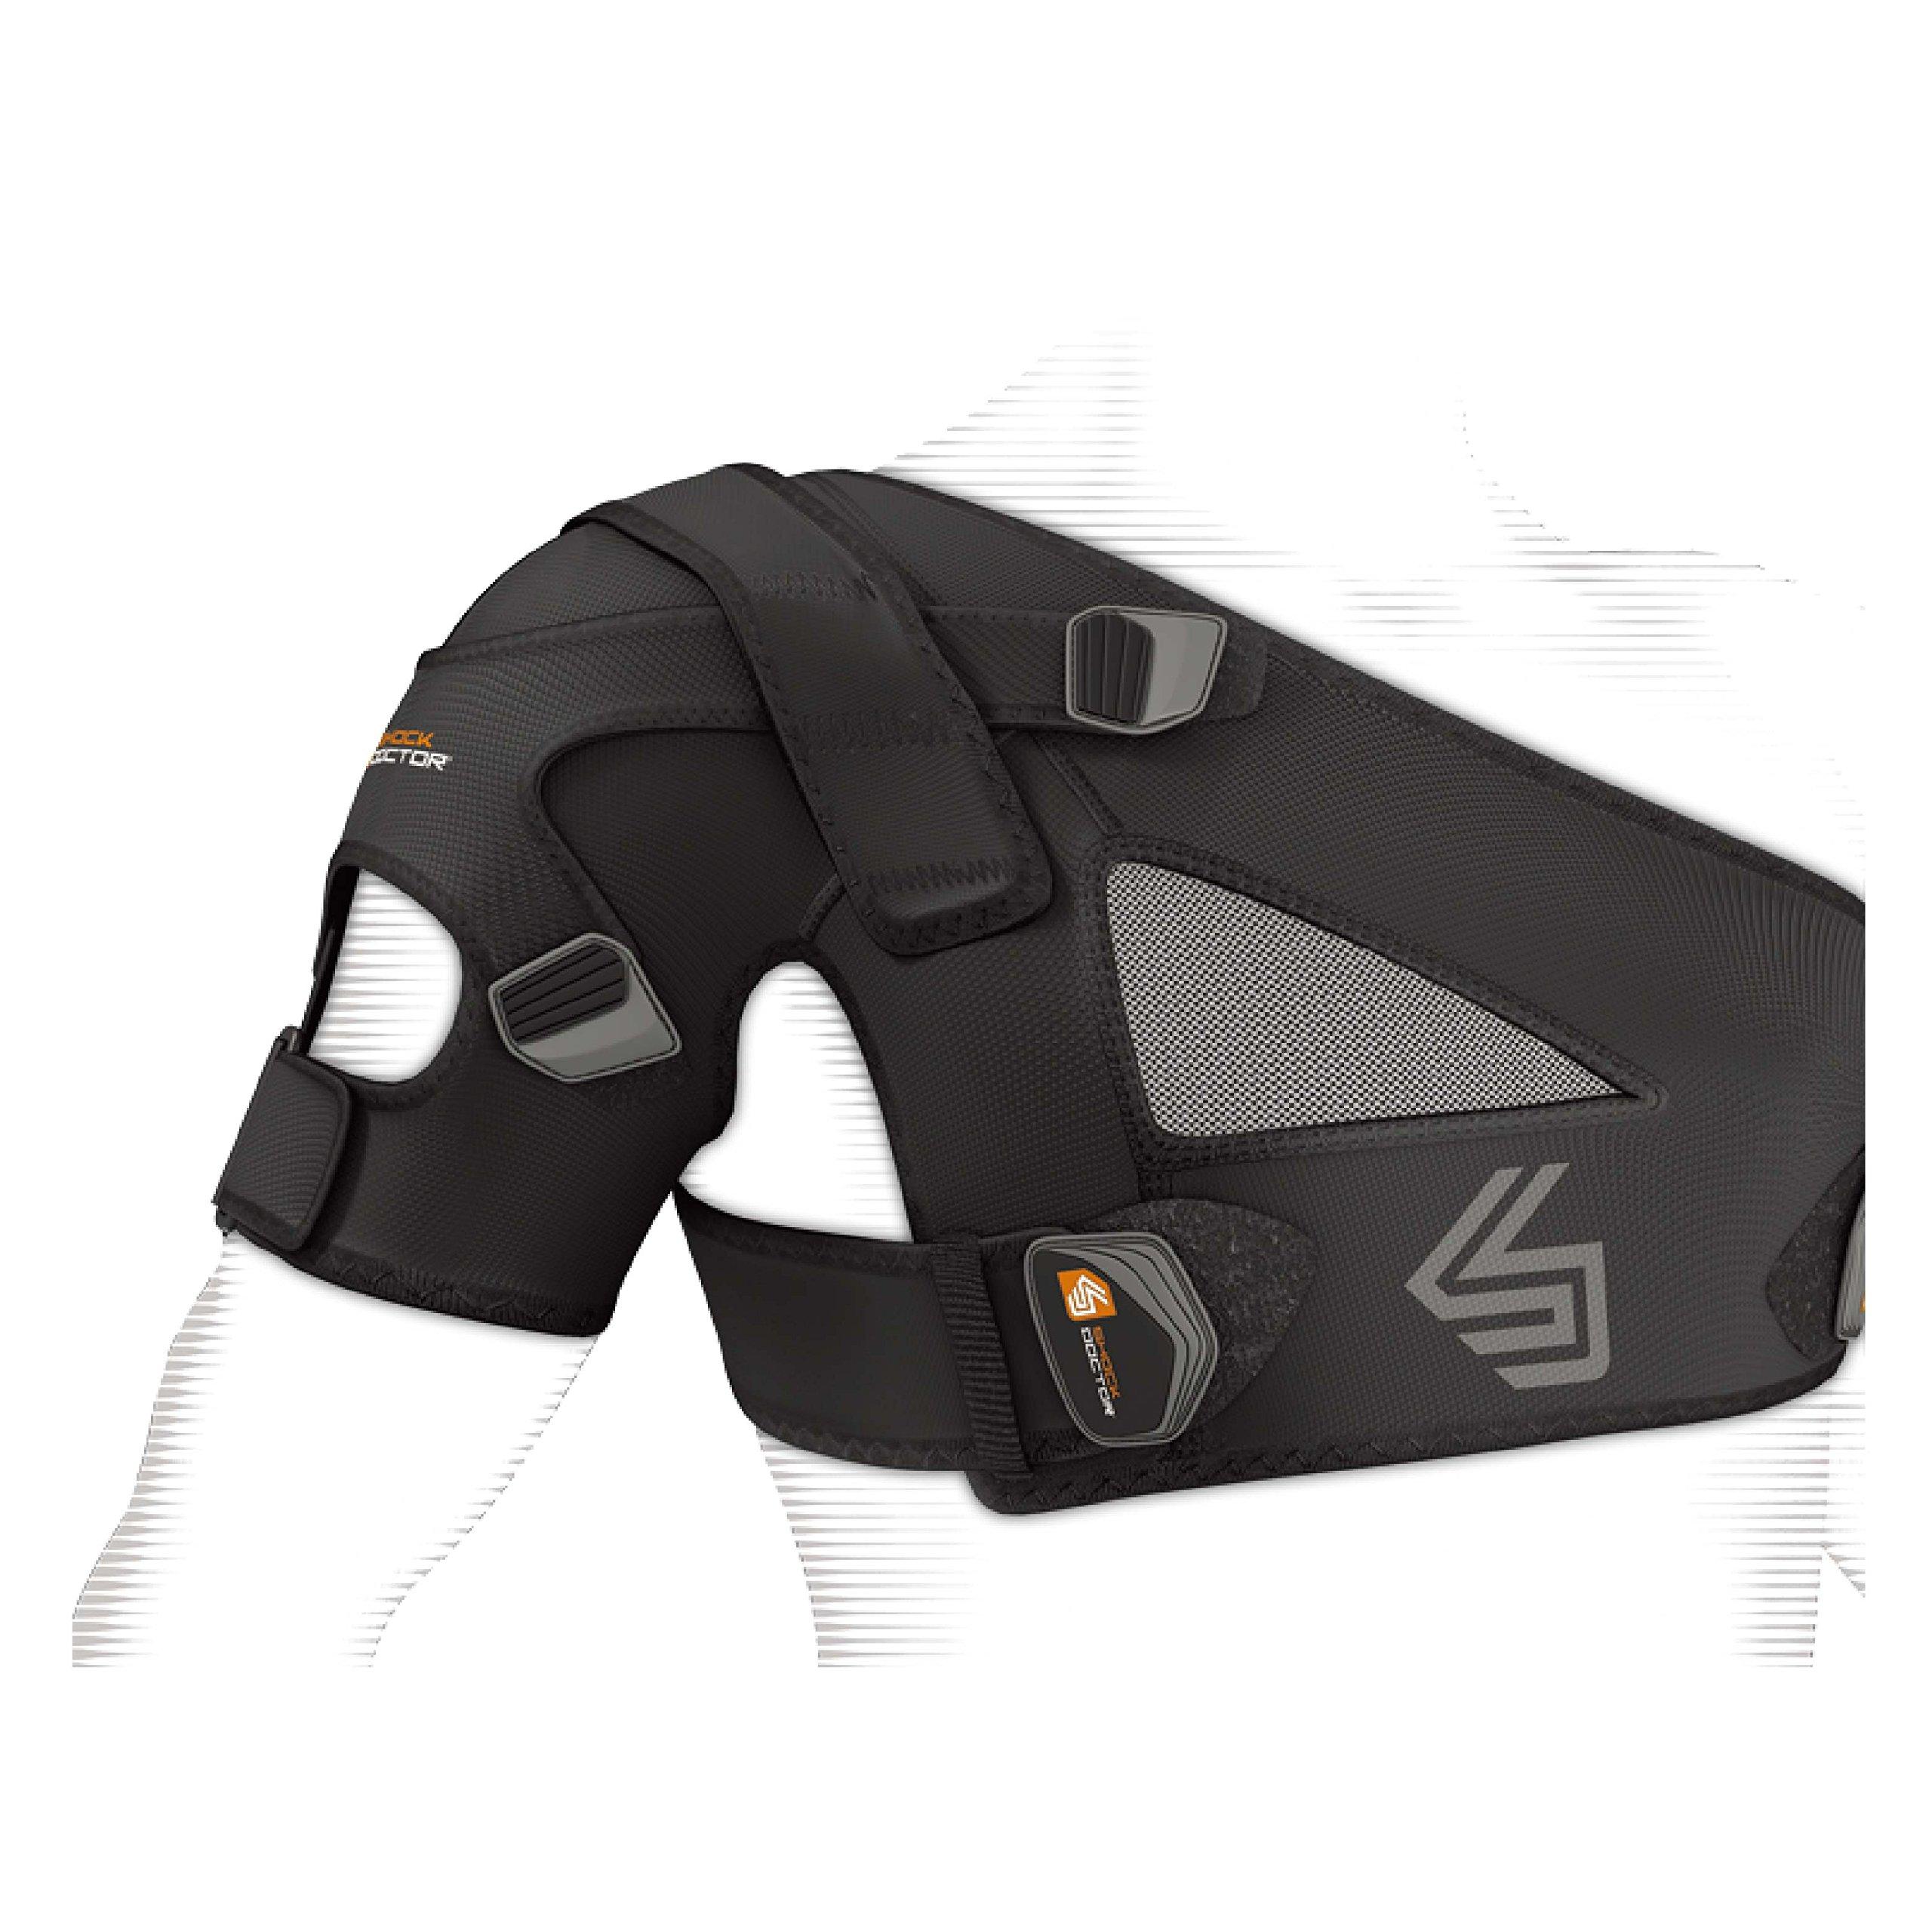 Shock Doctor Shoulder Support (Black, X-Small) by Shock Doctor